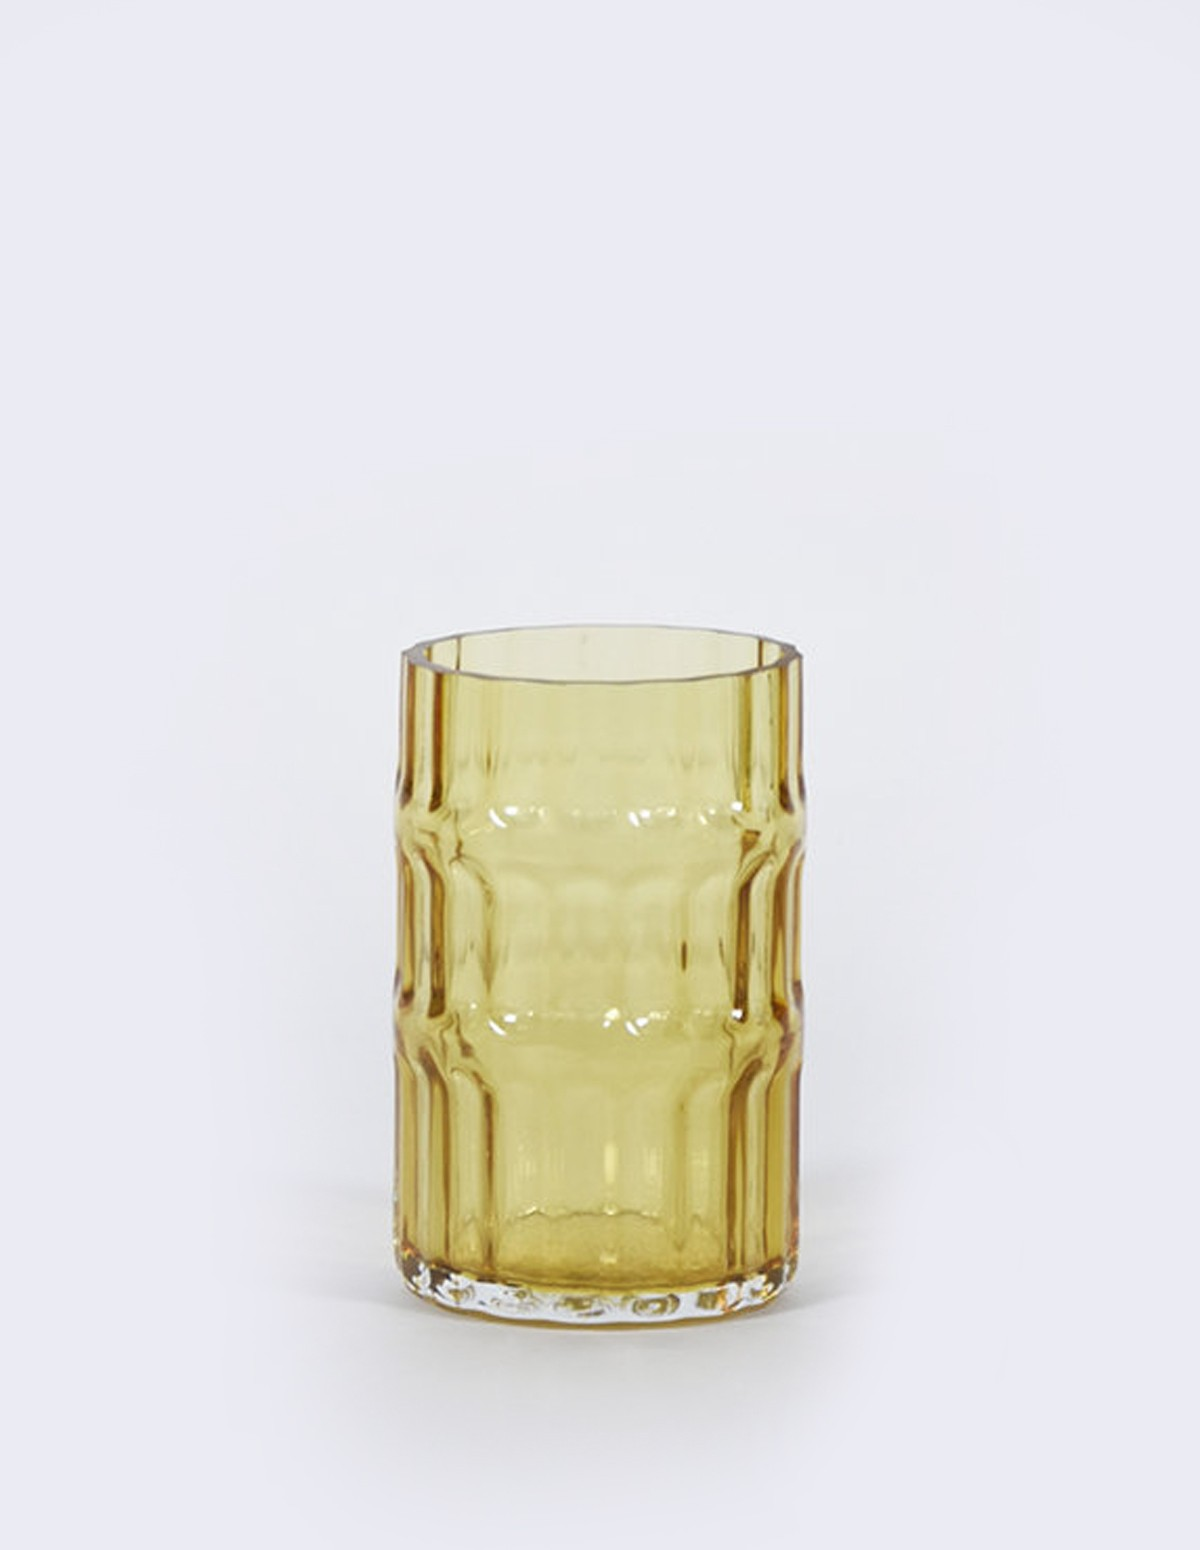 Eno Studio Ondin Small Vase - AMBRE